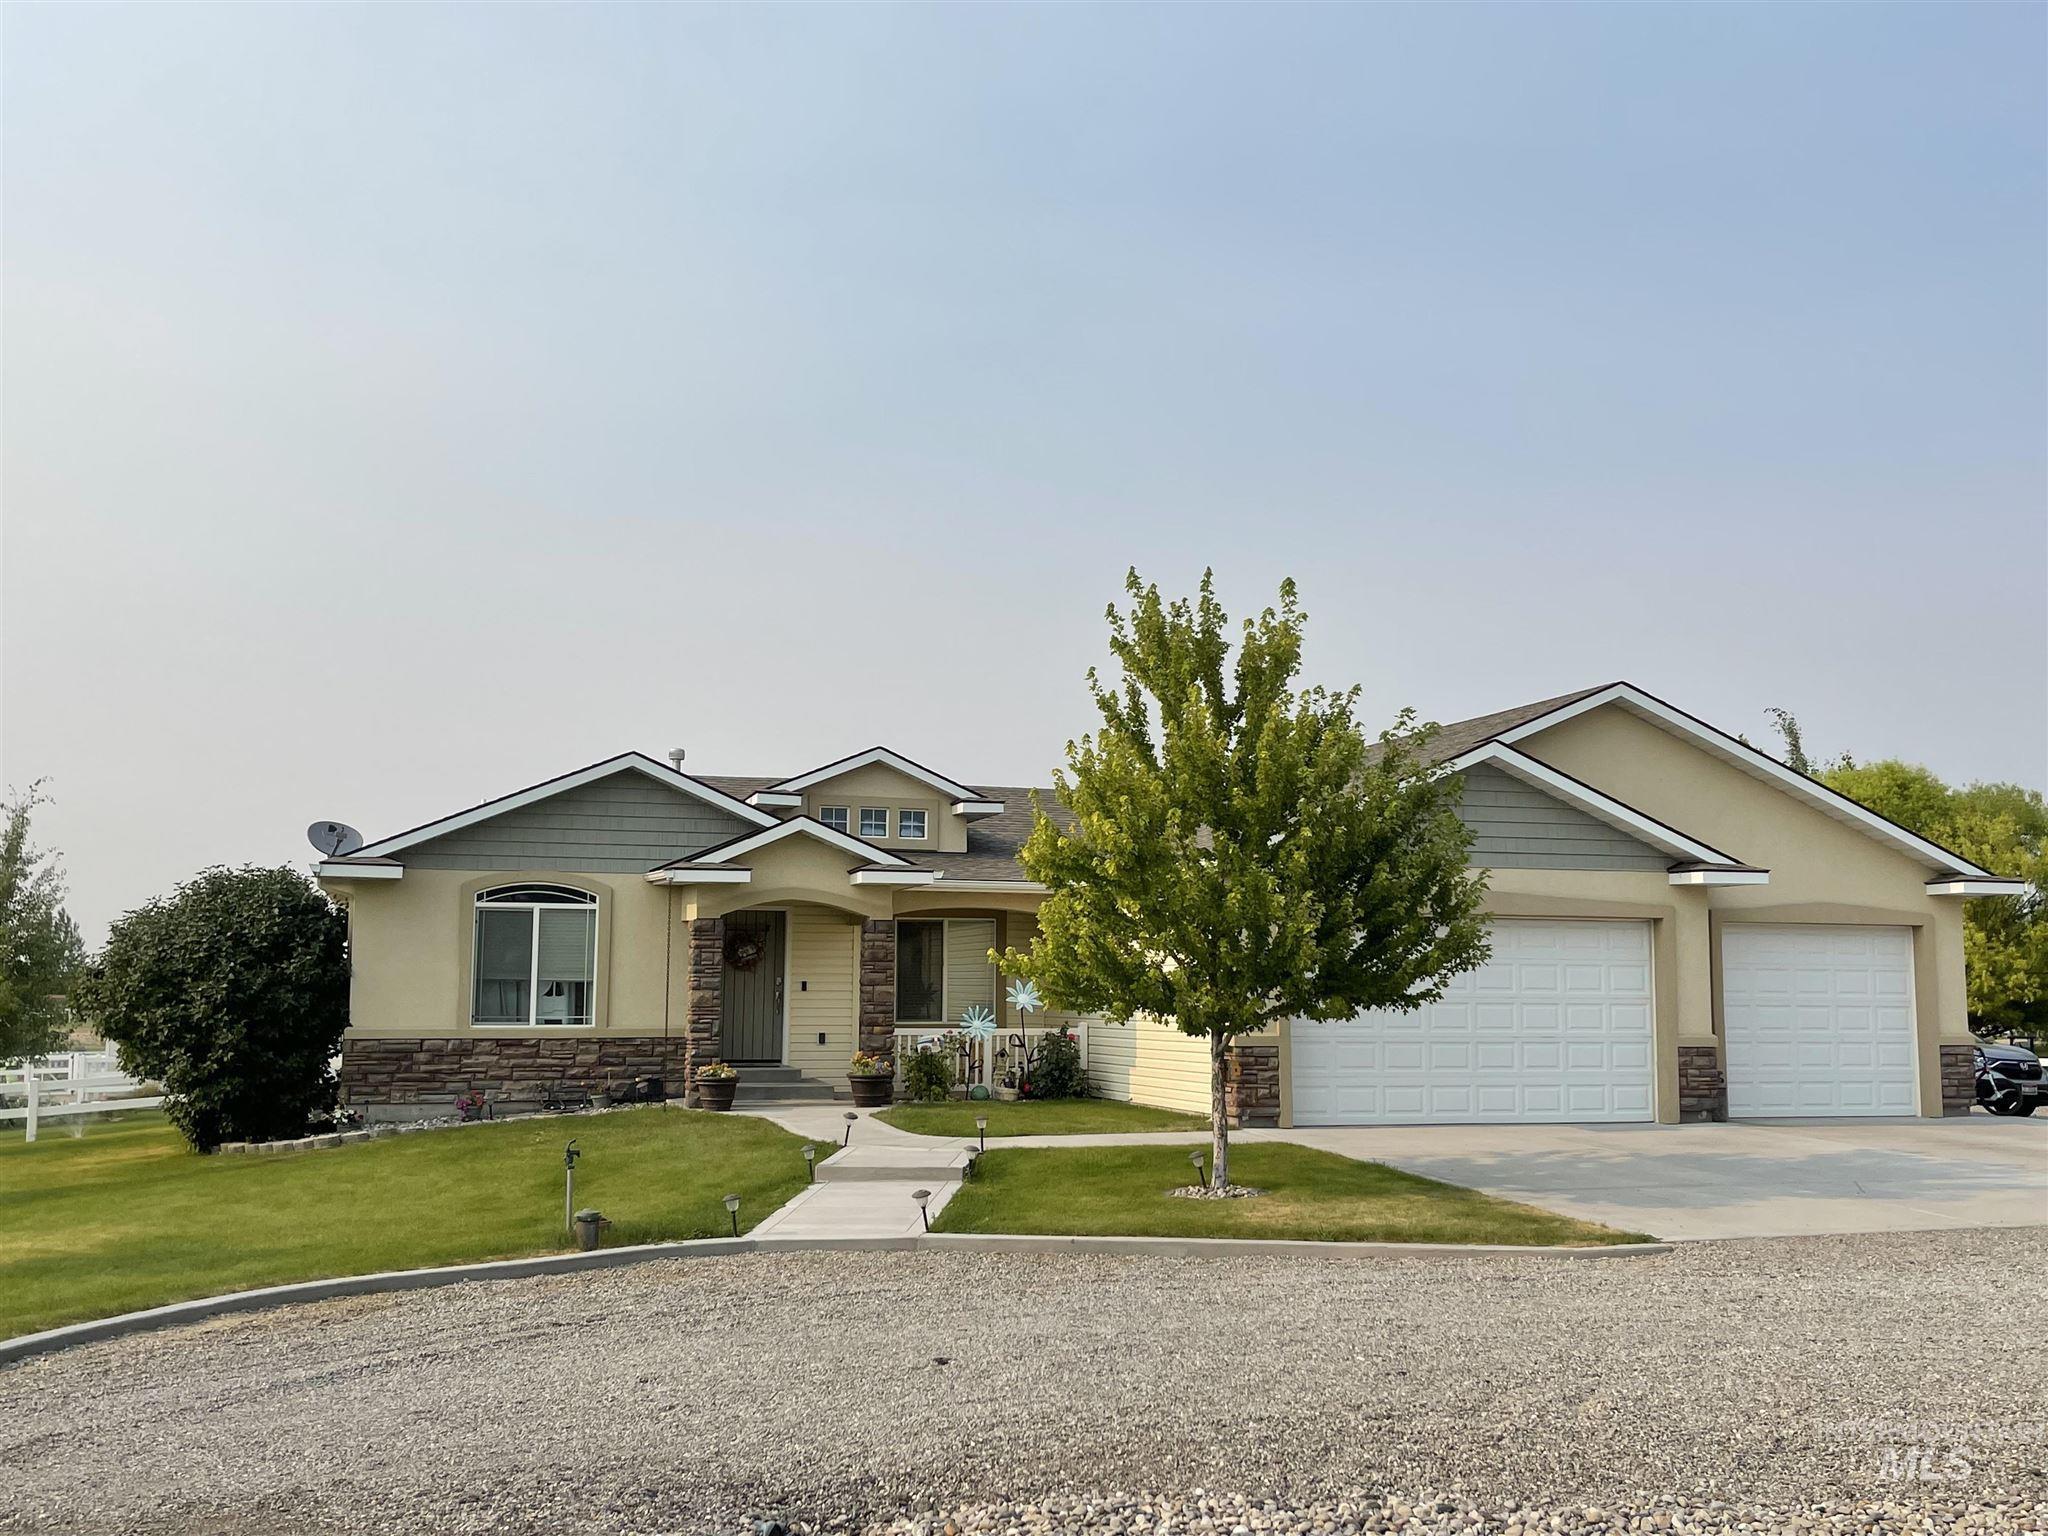 3708 E 3770 N Property Photo 1